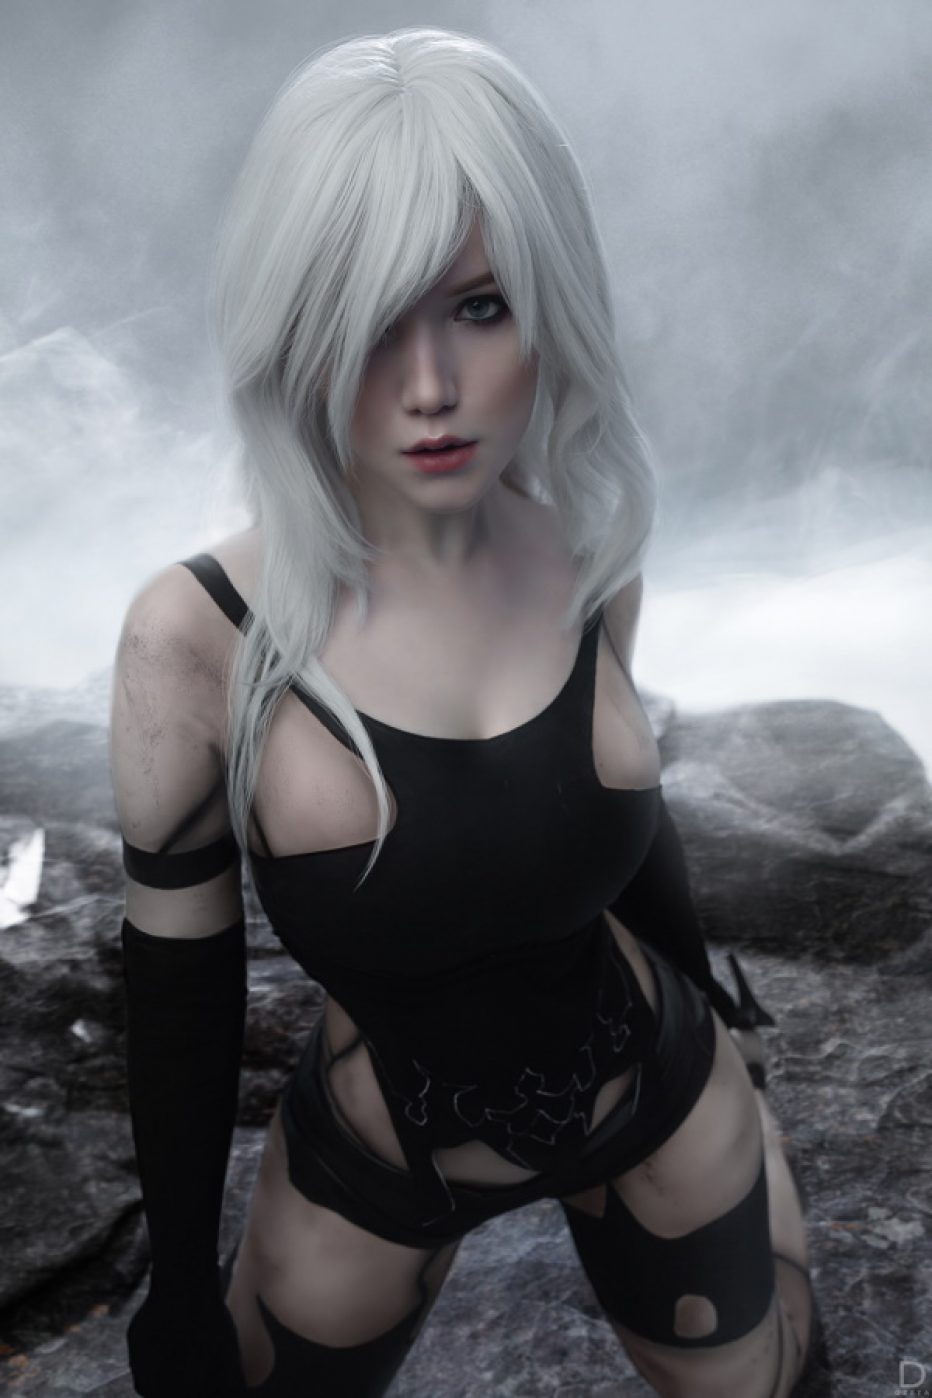 Nier-Automata-A2-Cosplay-Gamers-Heroes-1.jpg